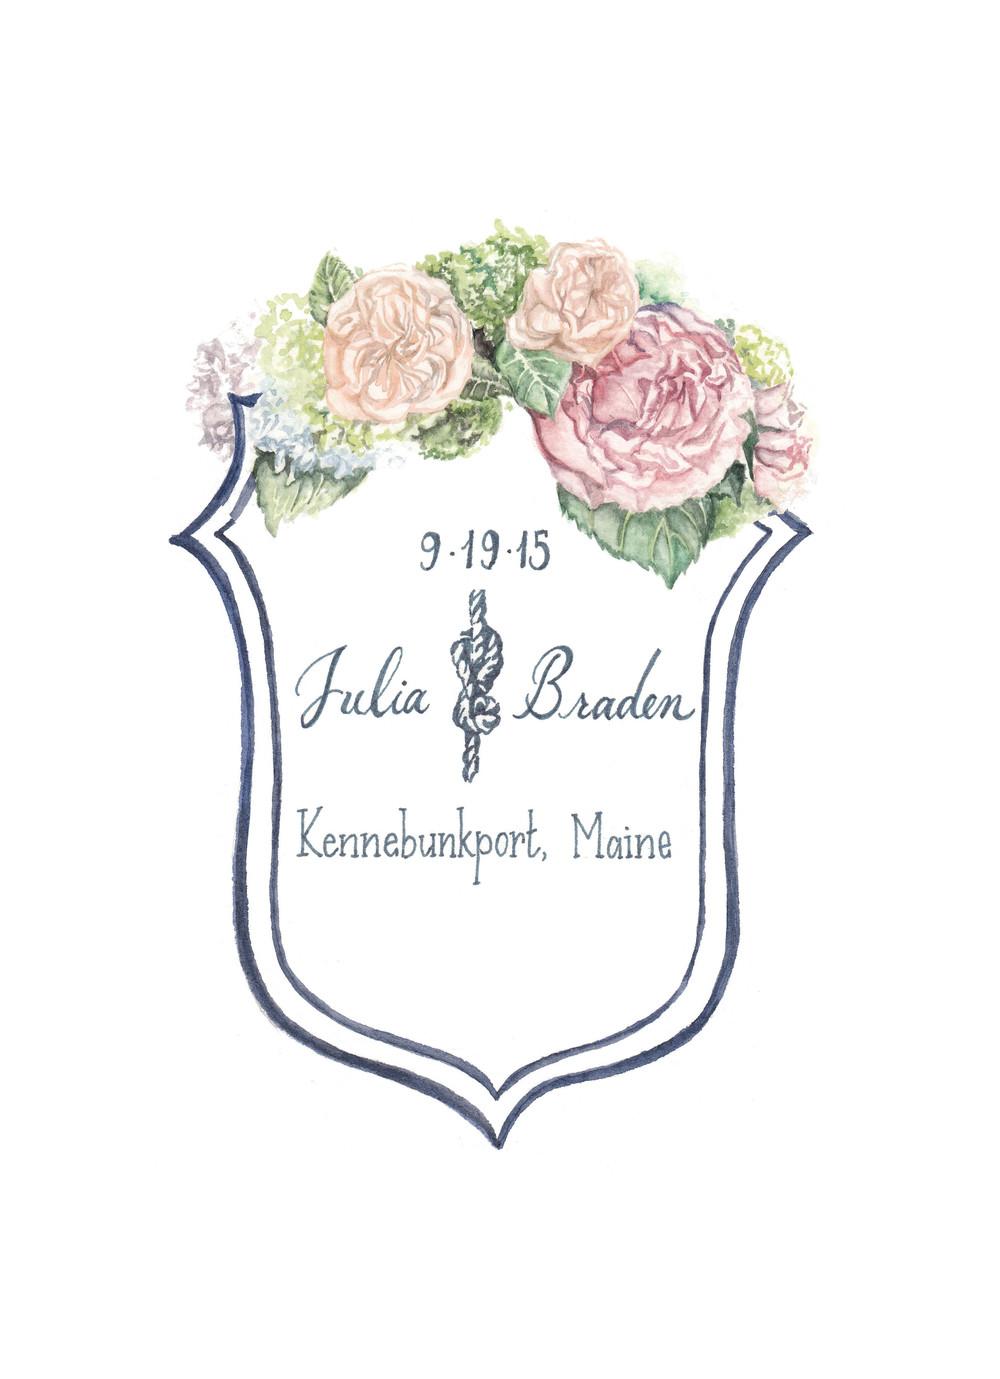 JuliaandBradenweddingcrest7.jpg